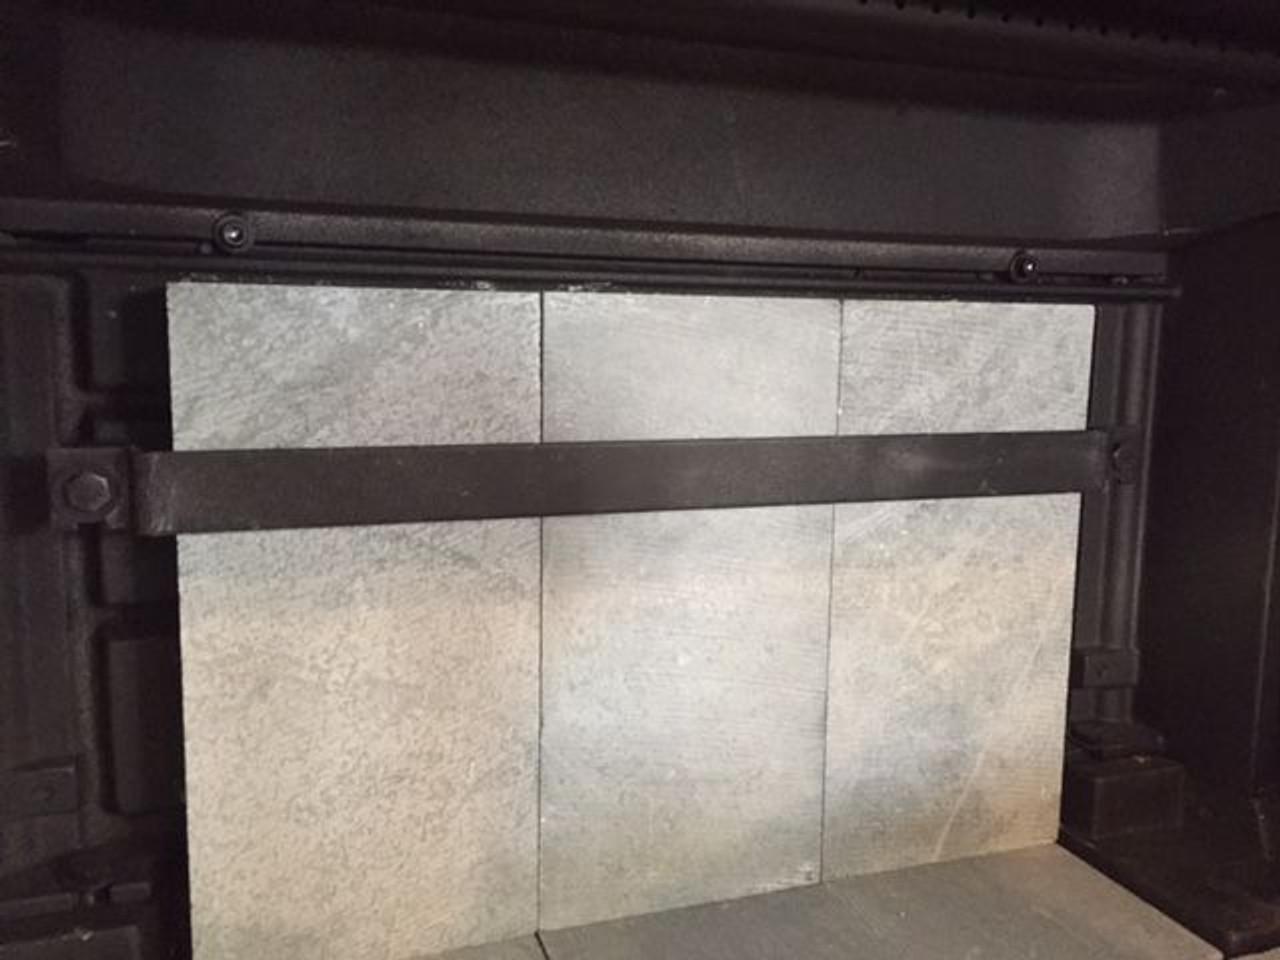 HearthStone Clydesdale Rear Brick Retainer (5490-050)